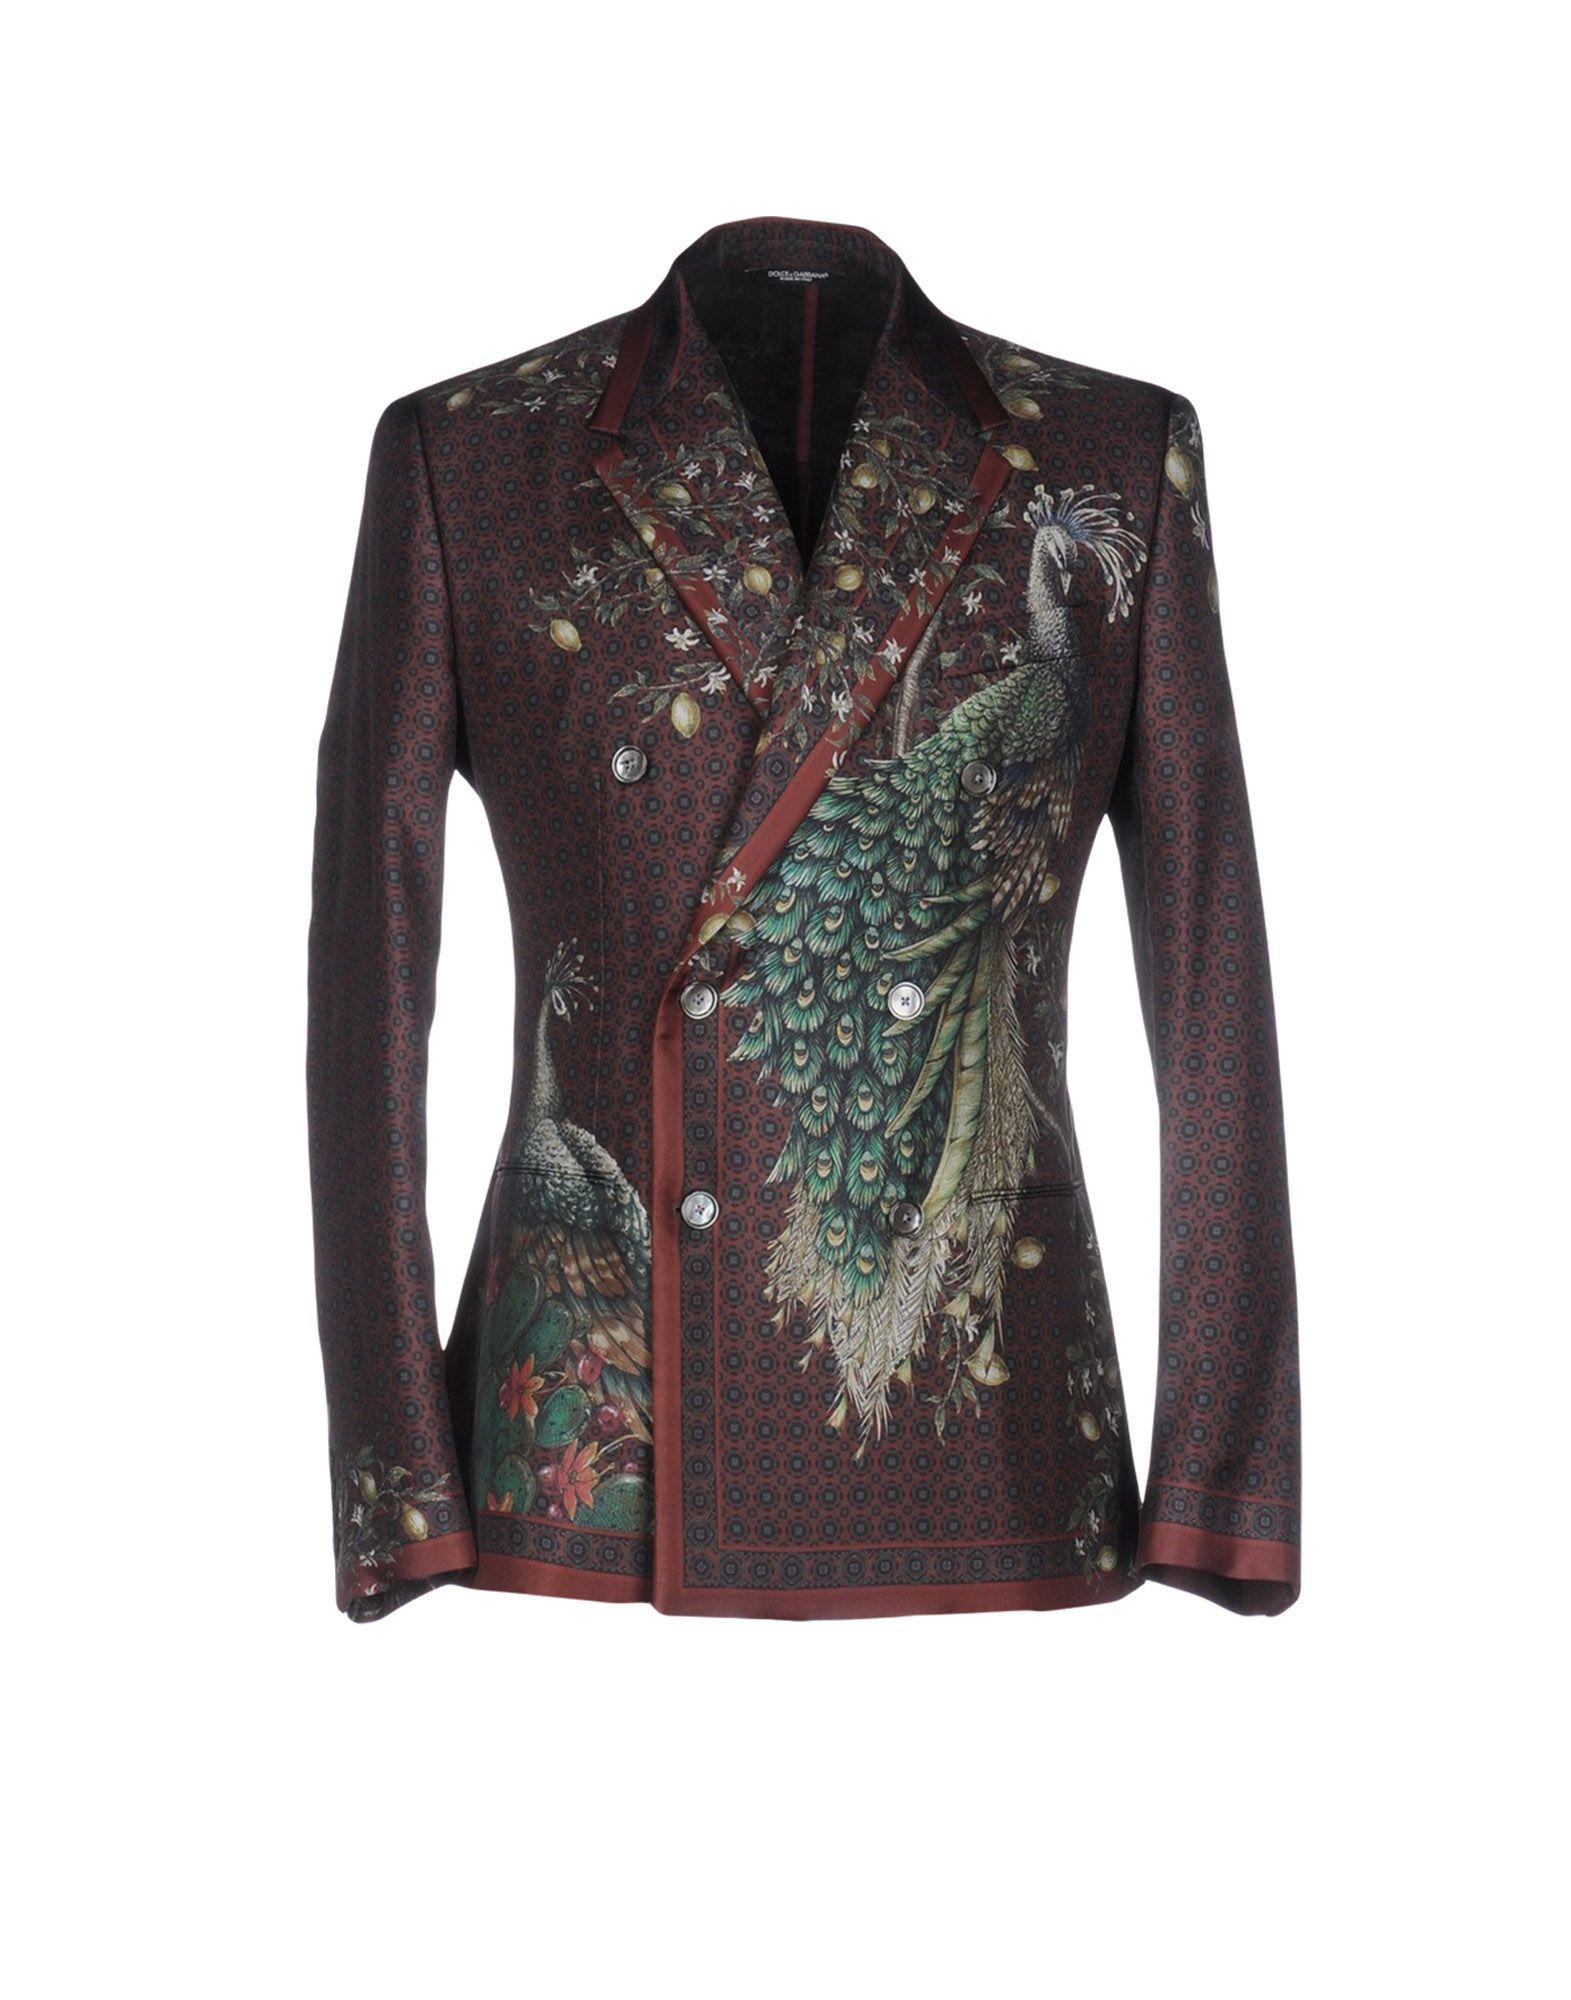 Giacca Giacca Giacca Dolce & Gabbana Uomo - 49236144CB d21ceb